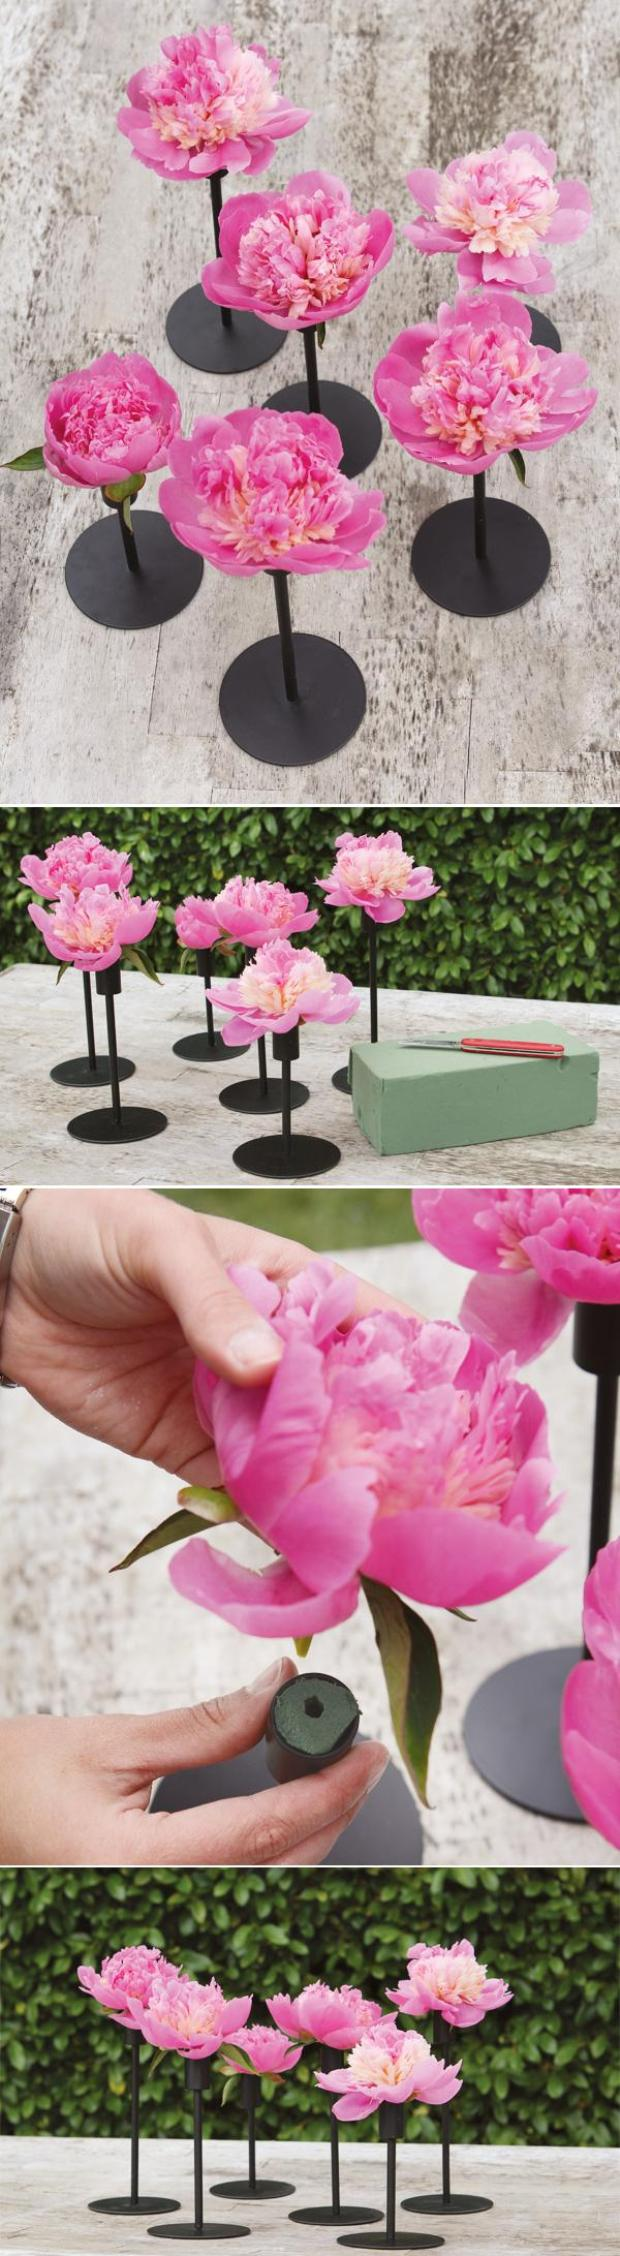 Fabulous DIY Wedding Centerpieces Wedding Centerpiece DIY: Candelsticks & Peonies